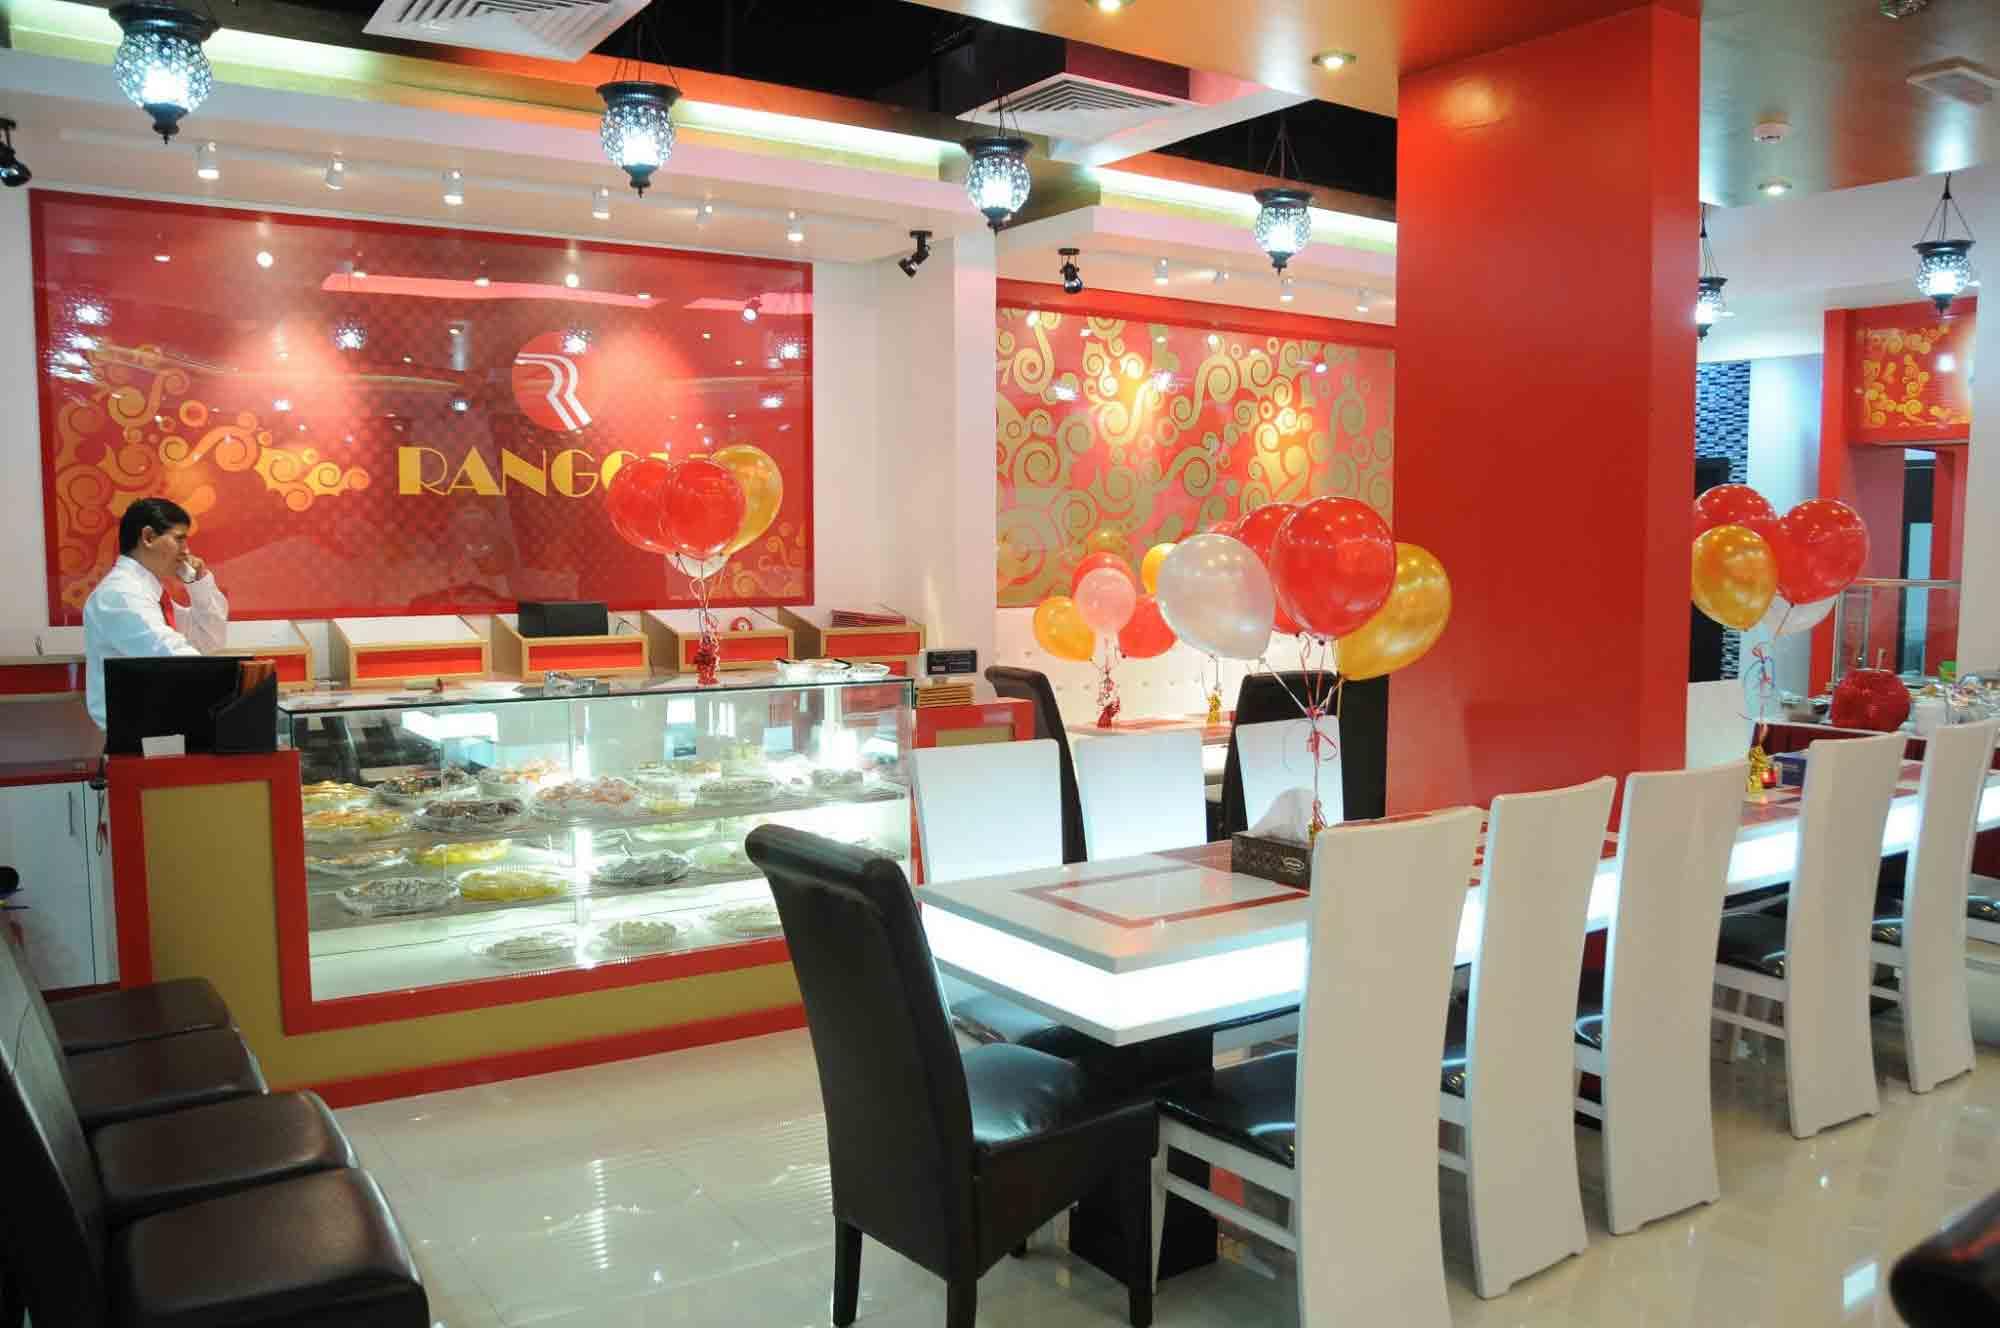 Rangoli in Dubai famous for Gujarati Thali